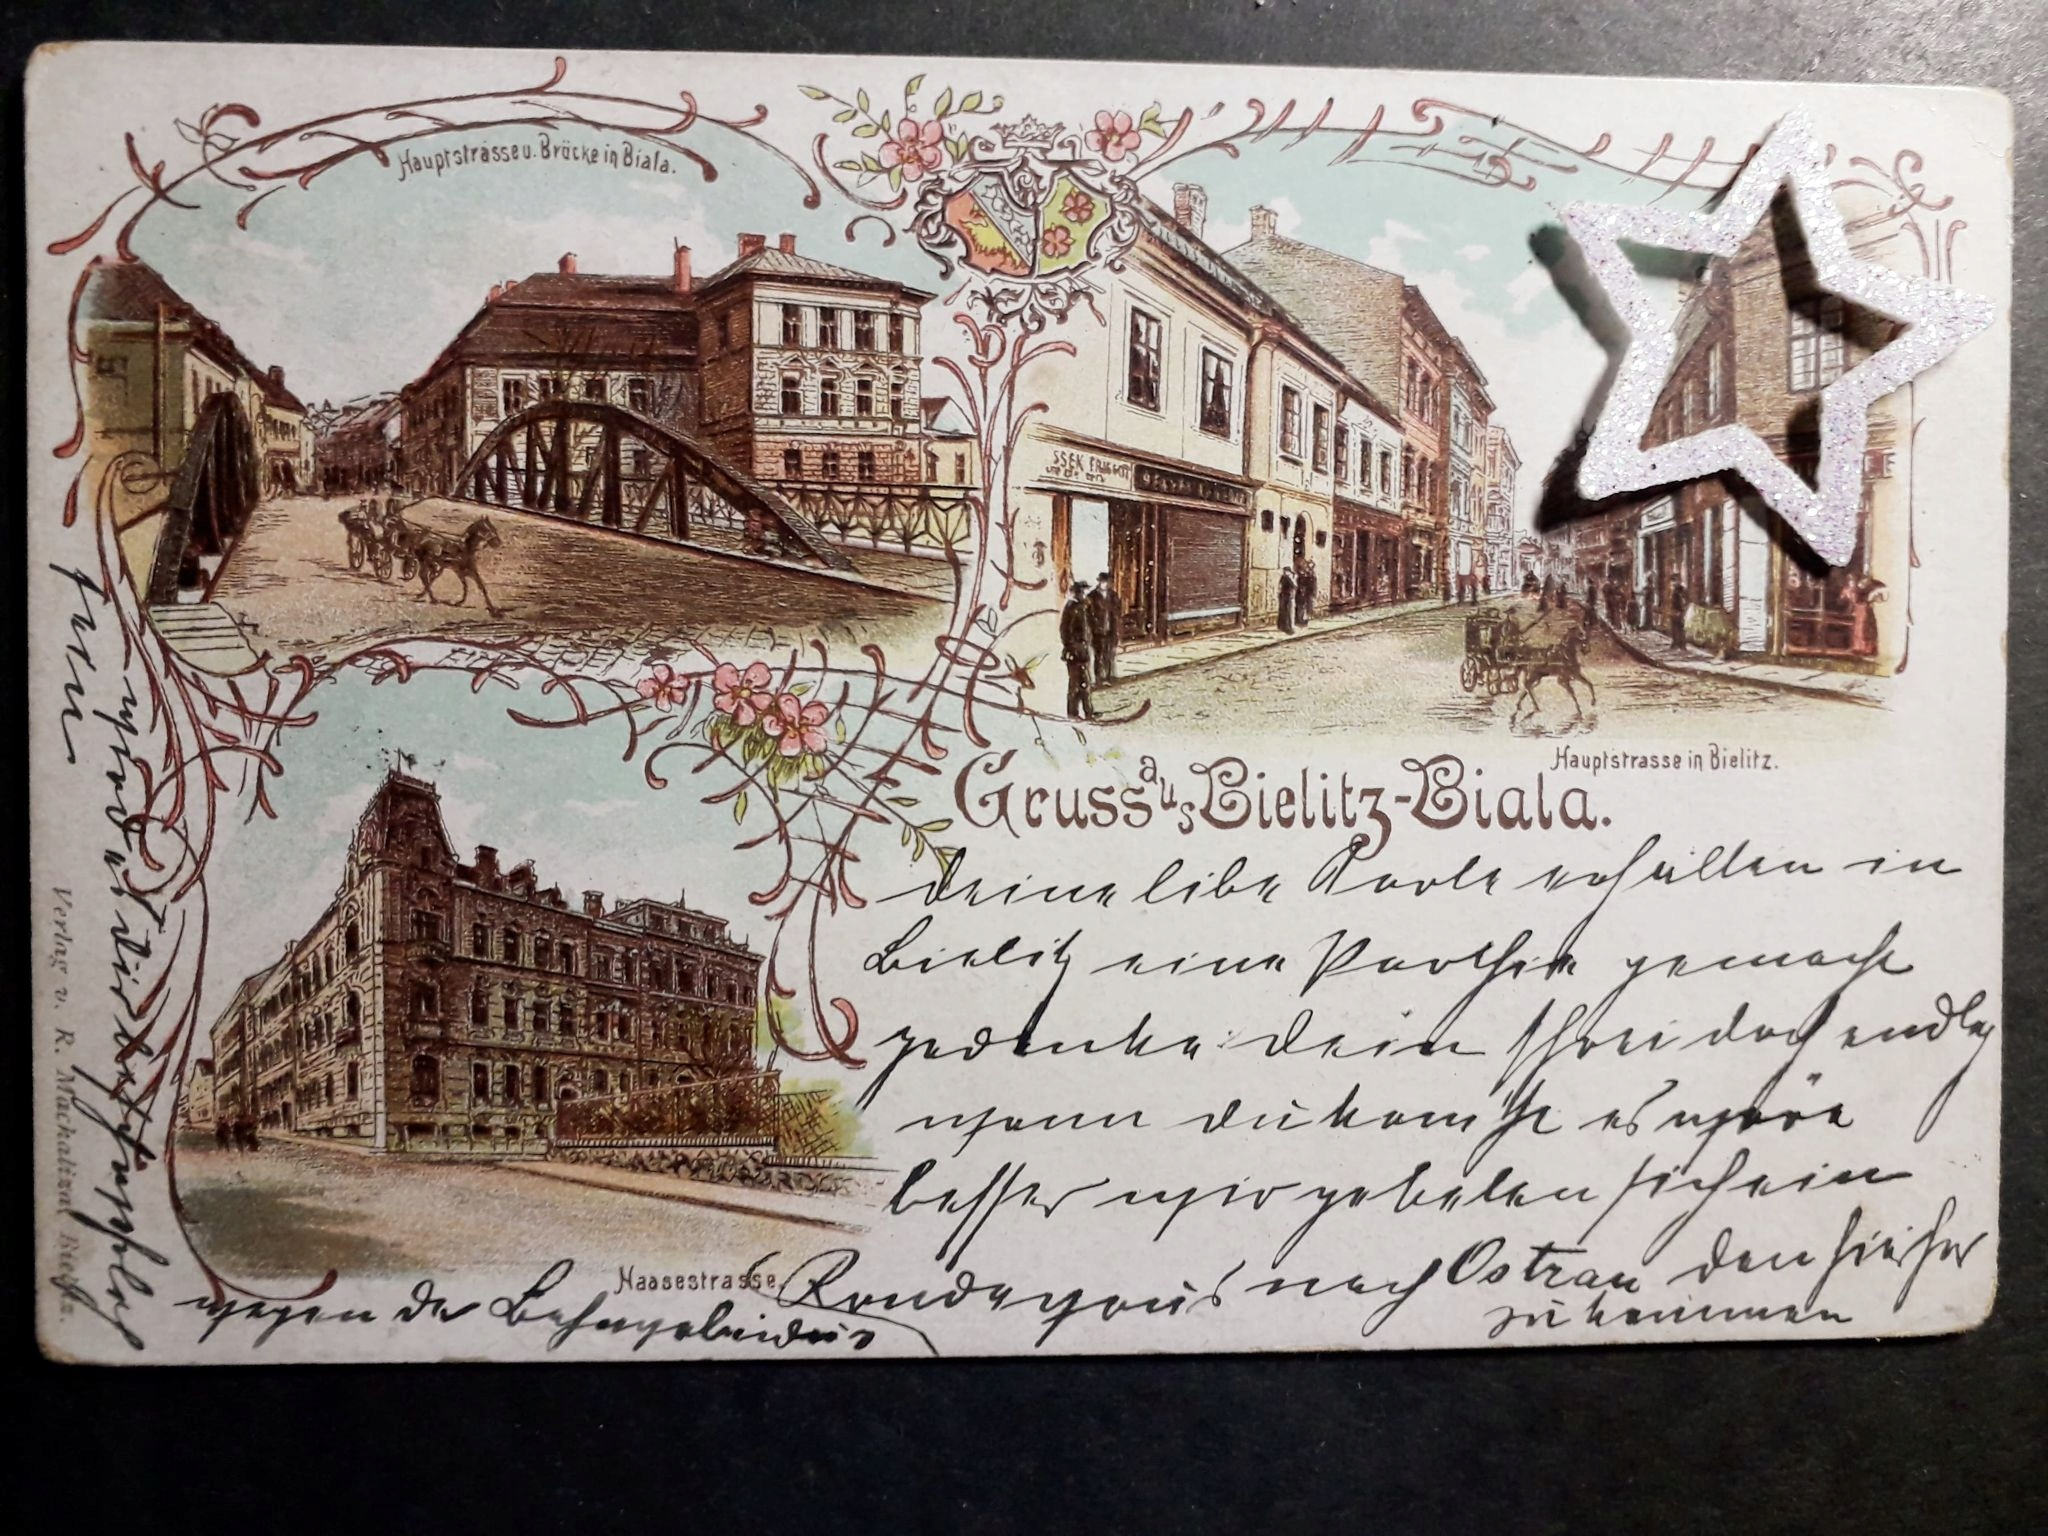 BIELSKO BIAŁA Gruss-Bielitz-Biala 1898r